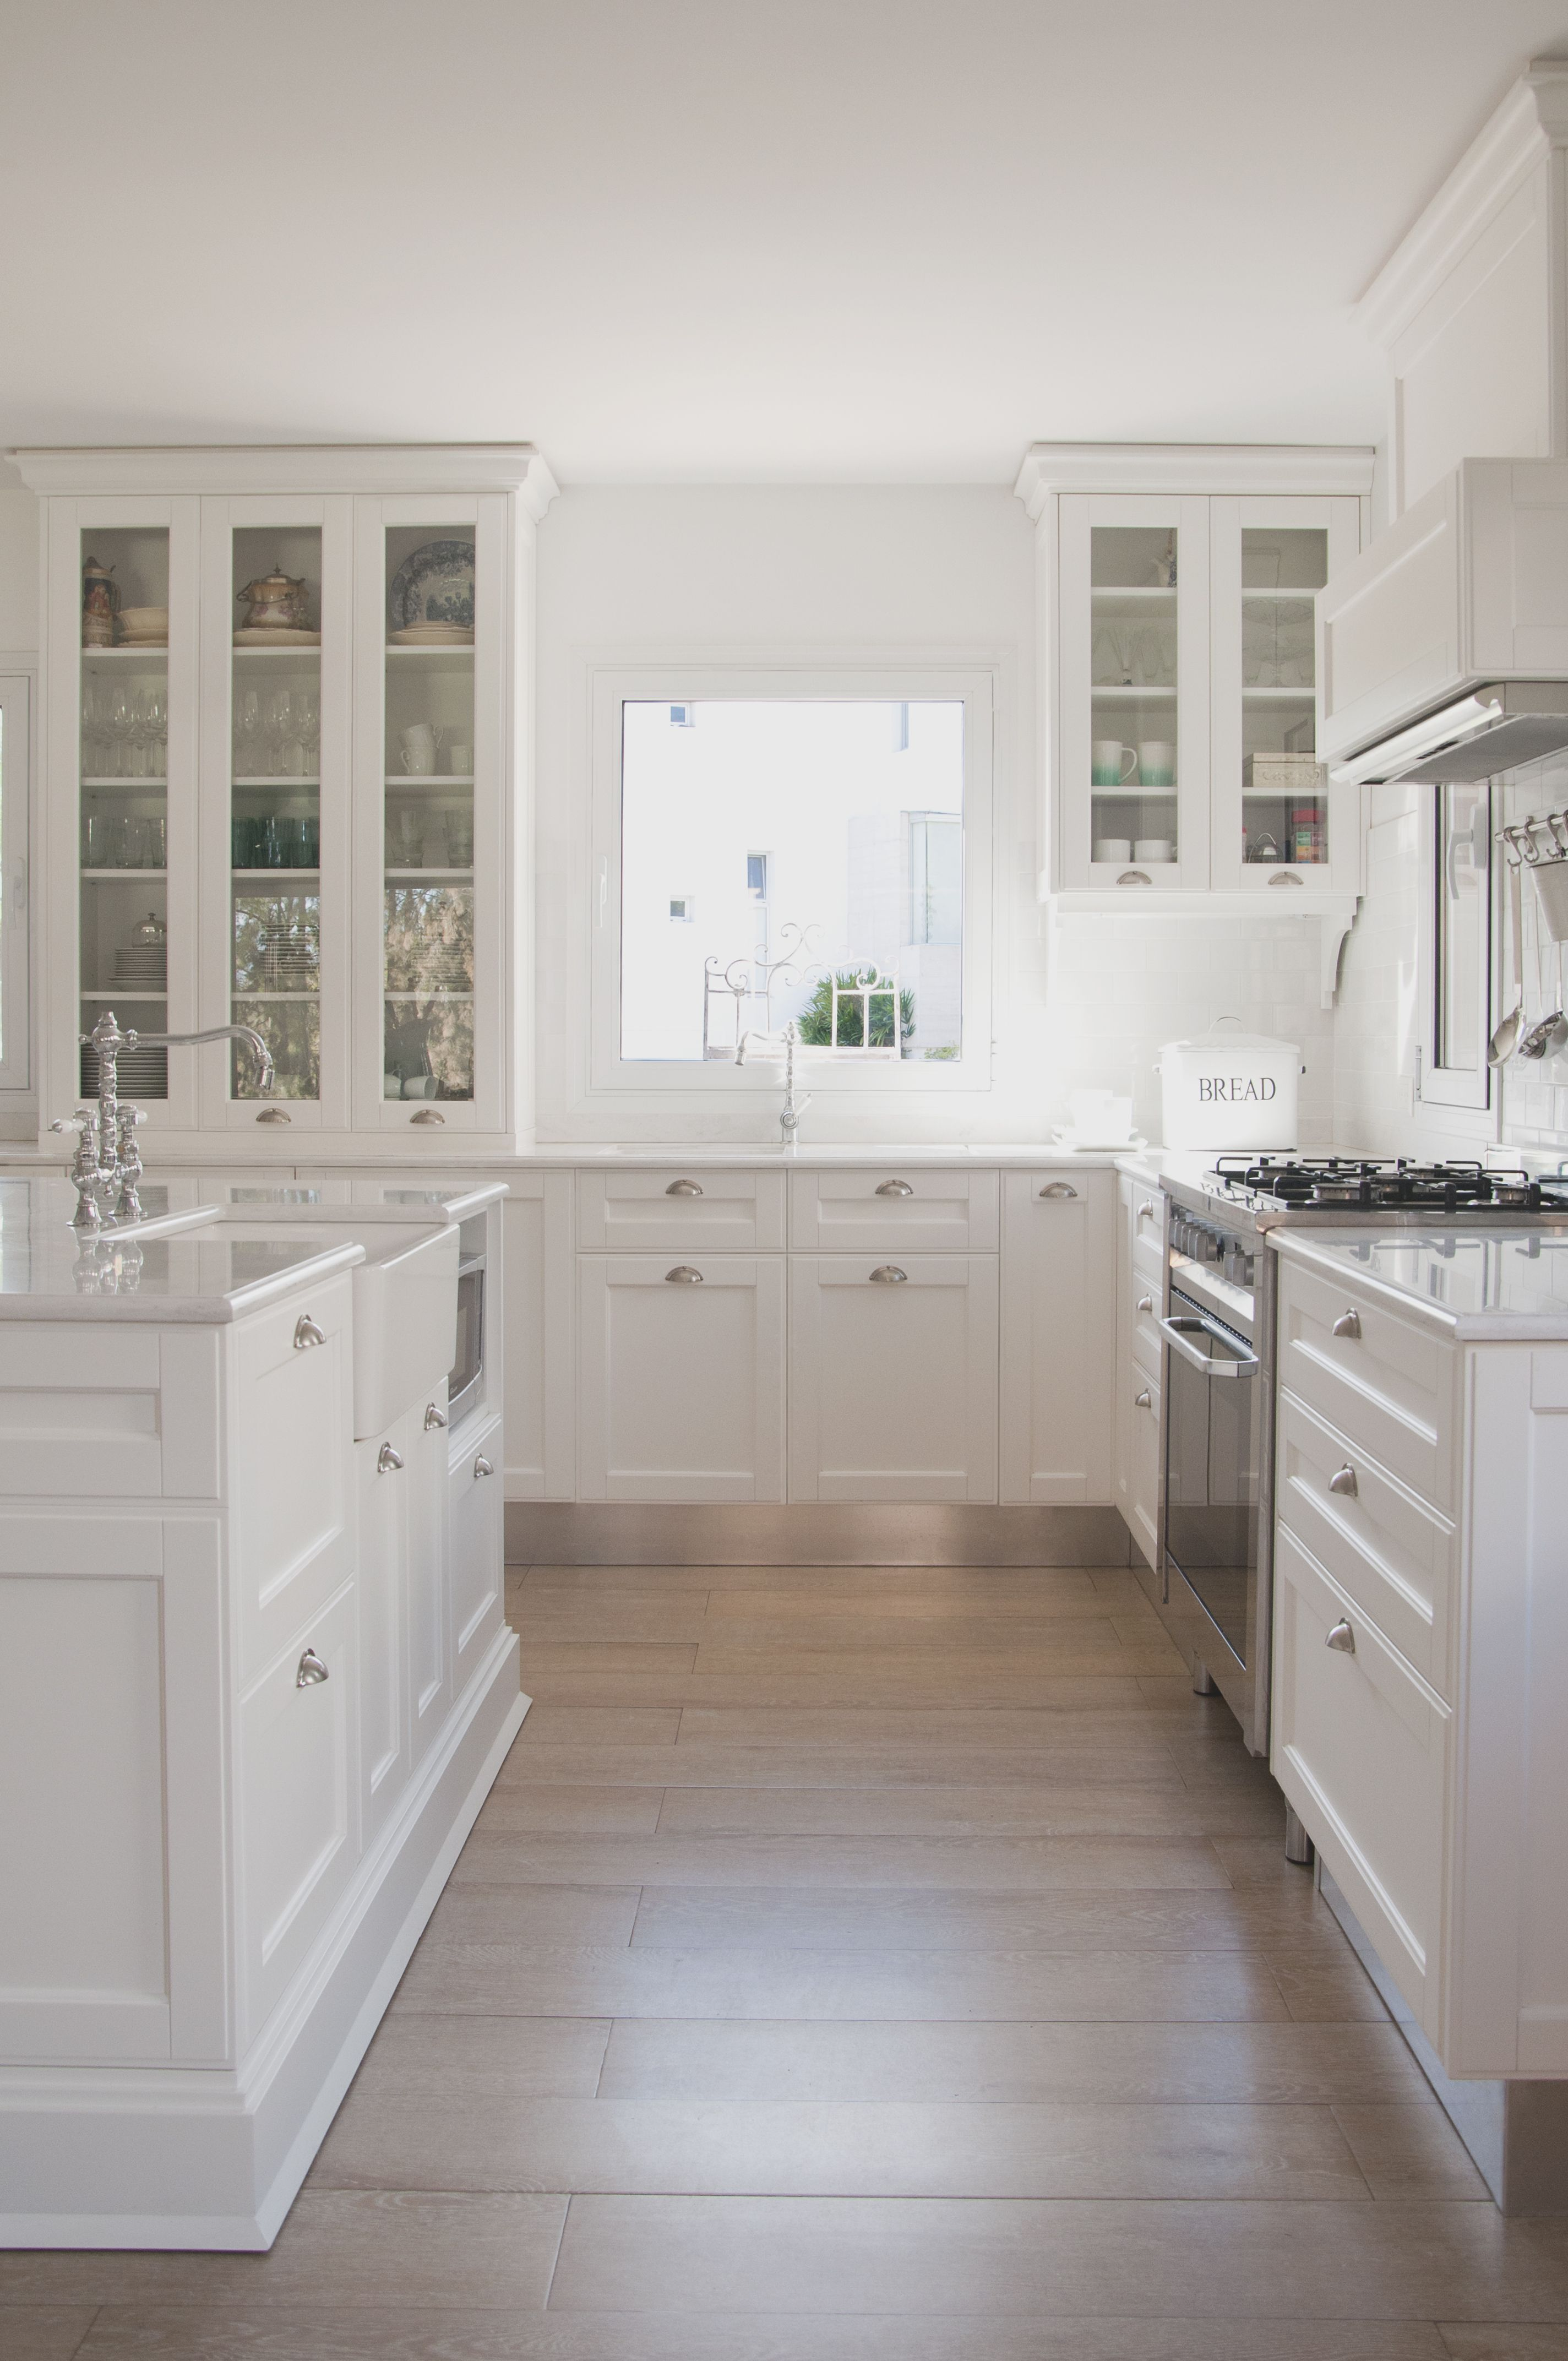 Home and interior inspiration @shabbyyhomes credit: @lindabvik ...